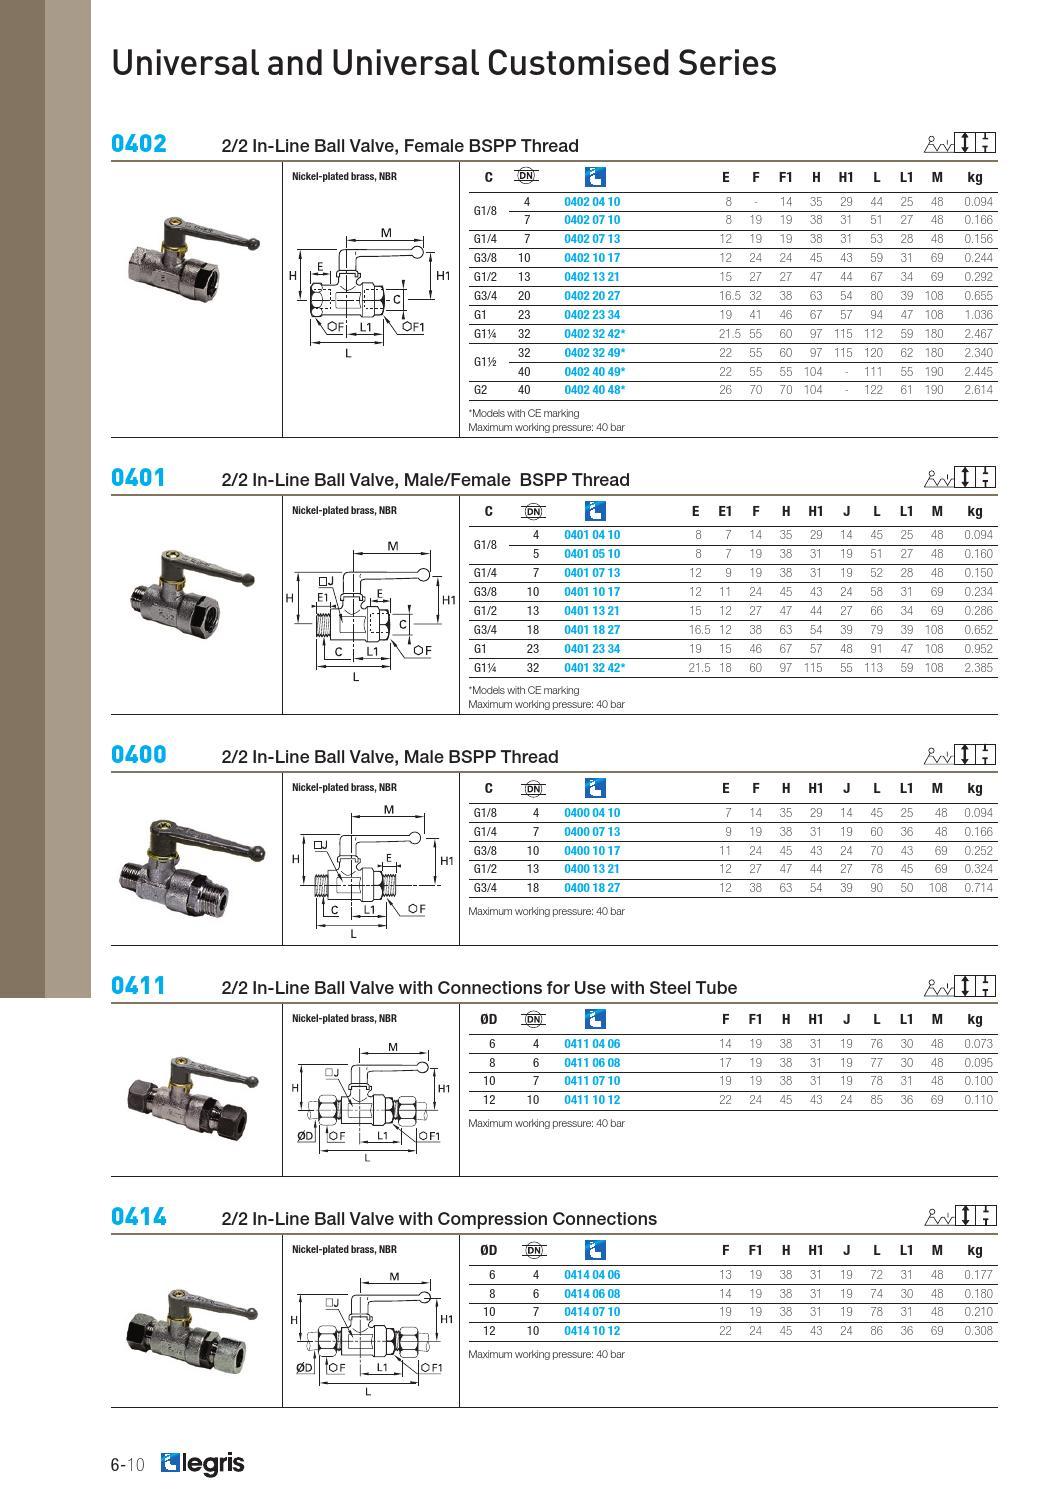 Terrassentr/äger Terrassentr/äger WPC Drehfu/ß Unterkonstruktion Terrassenlager 1-400 St/ück Gr/ö/ße: 18-32 mm Stelzlager BPC 20 Auflagefu/ß